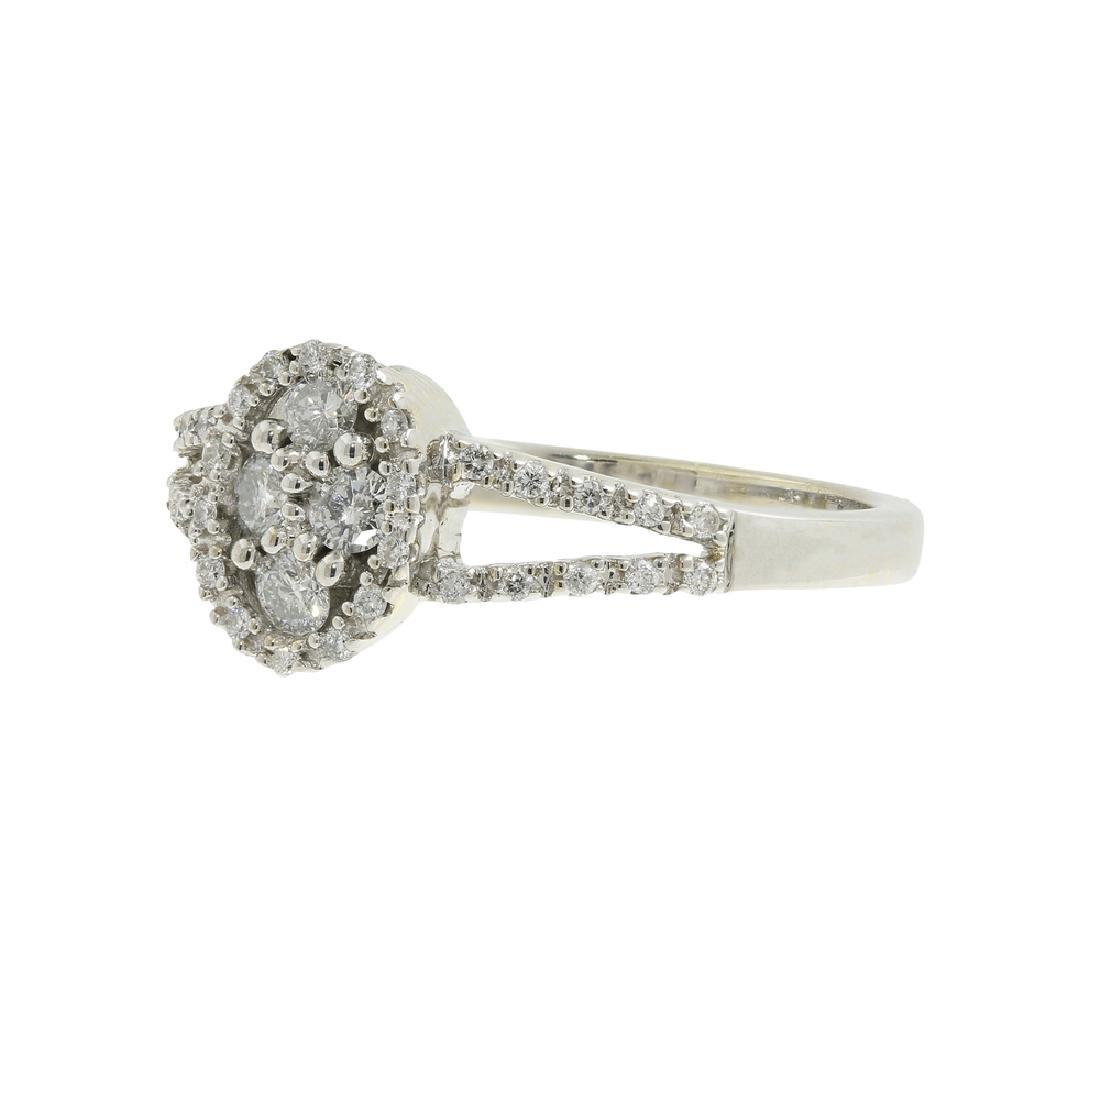 Charming Classic Estate 14K White Gold Ladies Diamond